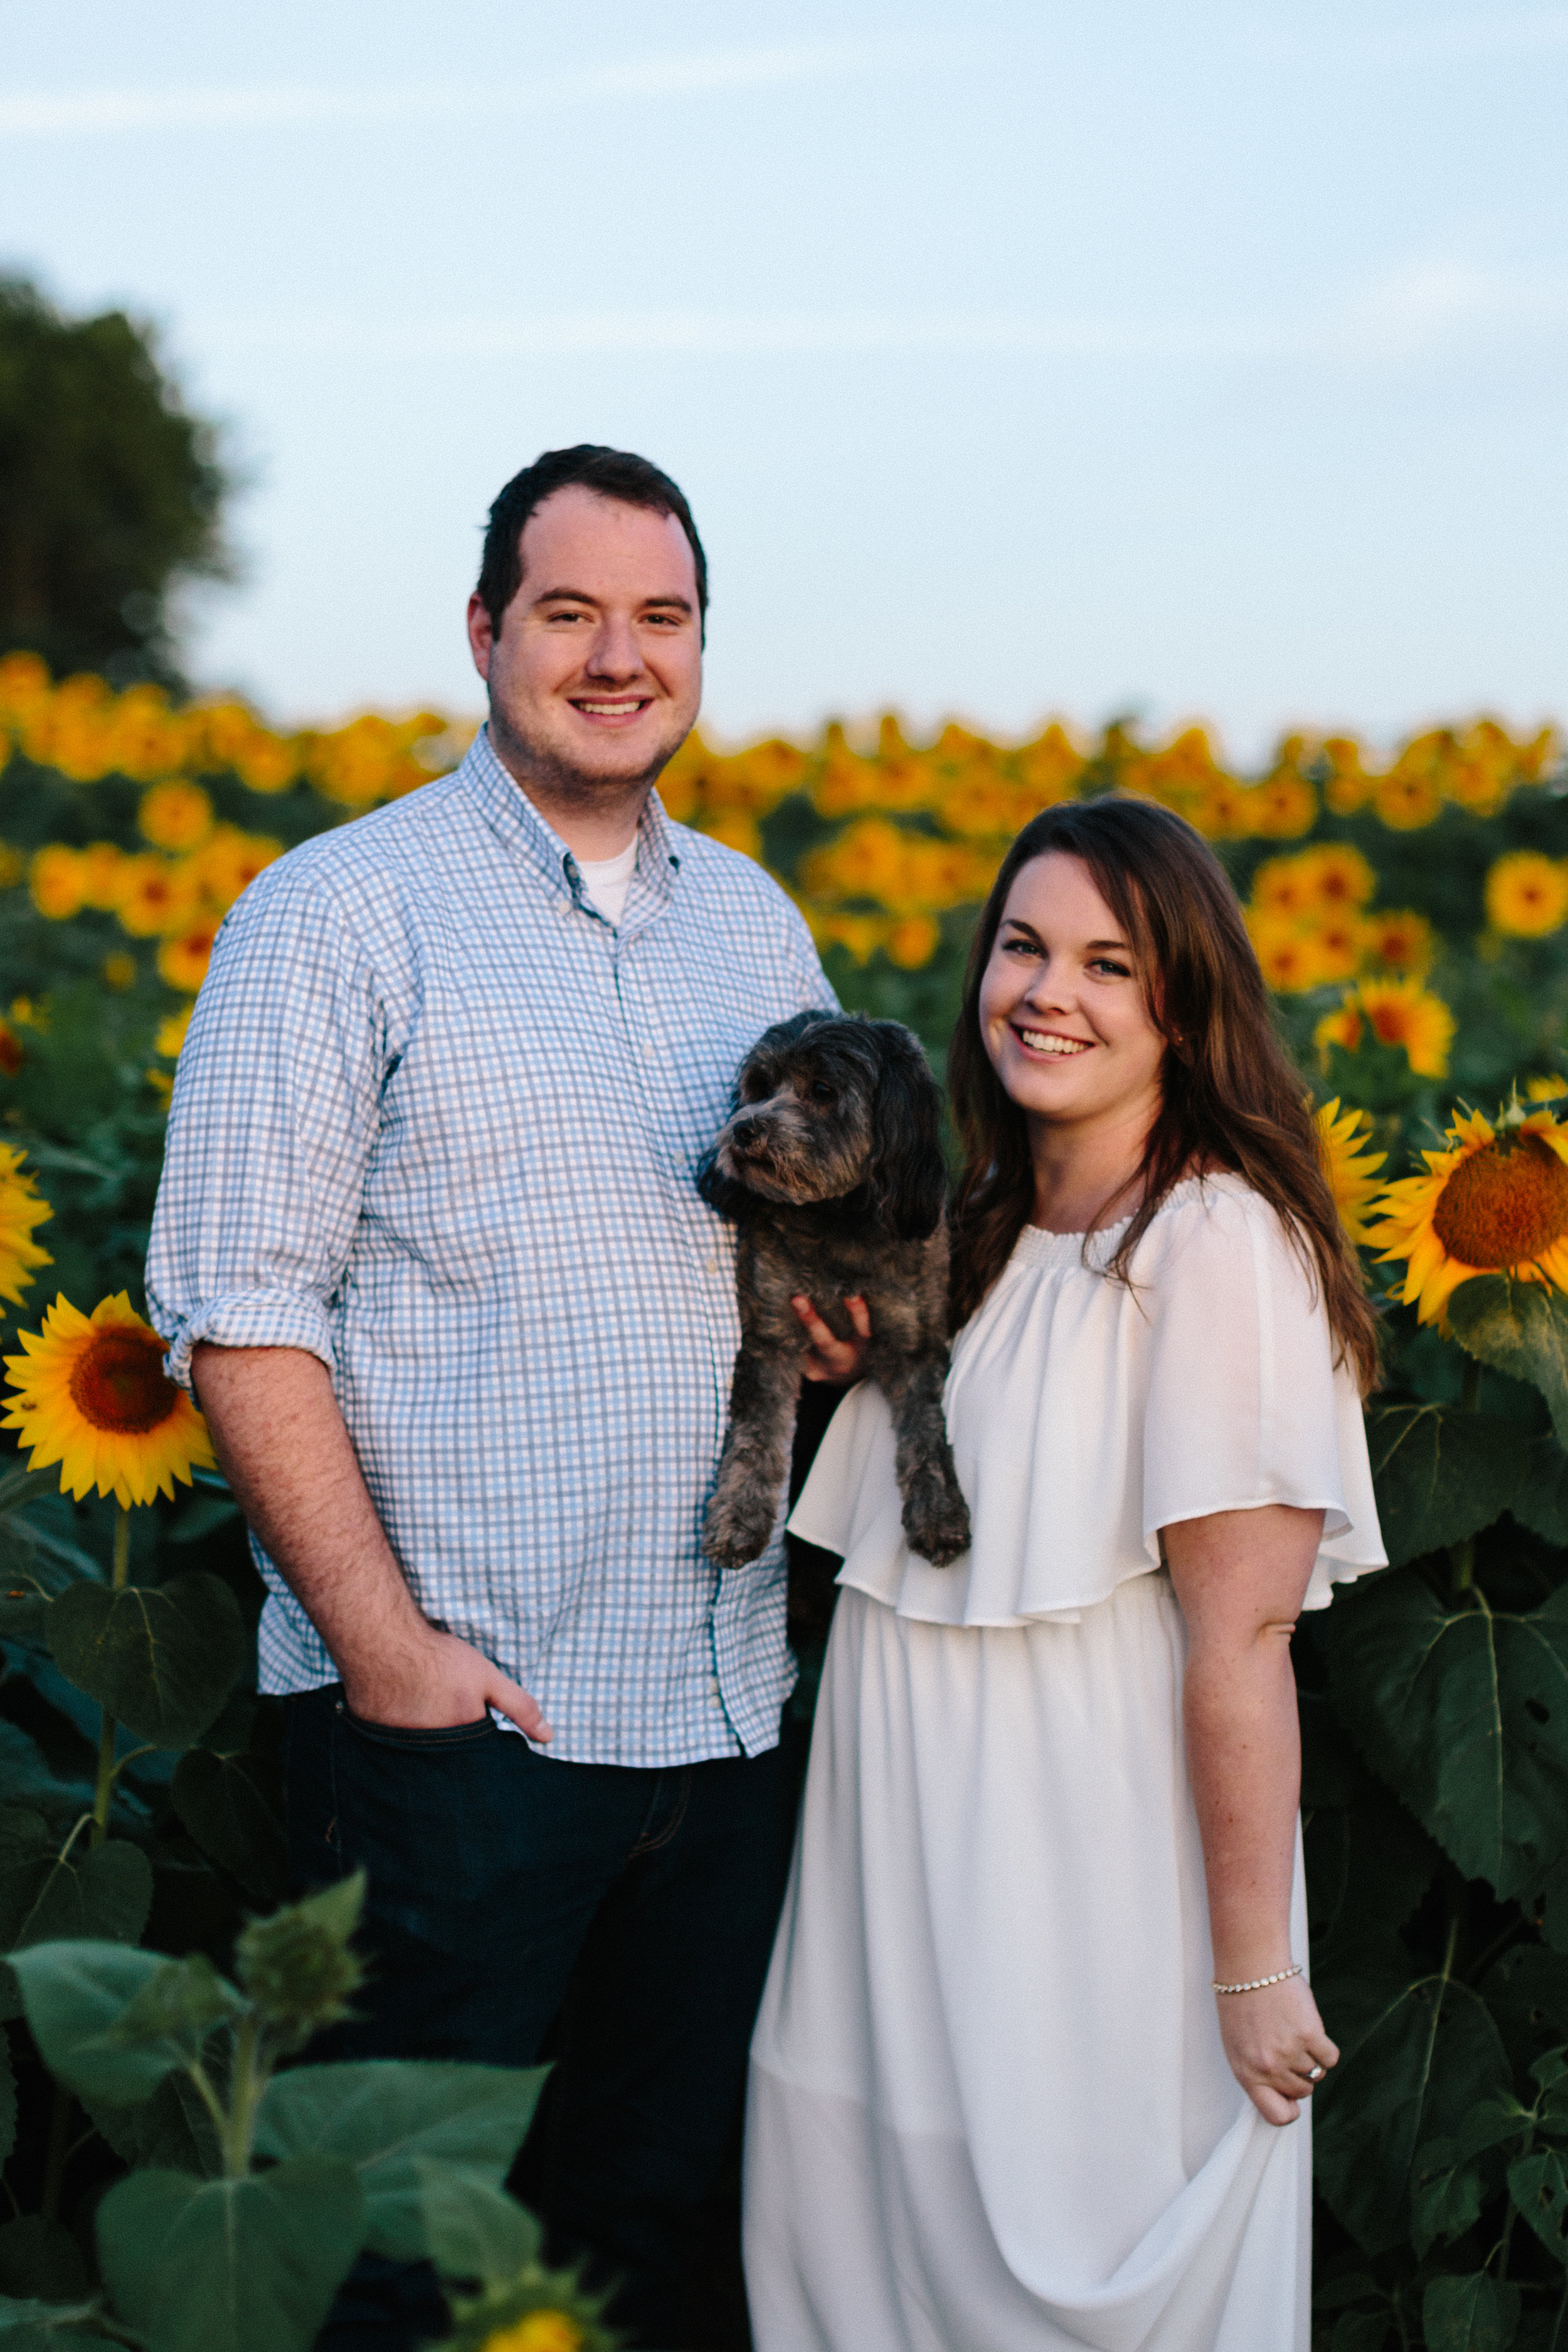 alyssa barletter photography sunflower field photos-8.jpg